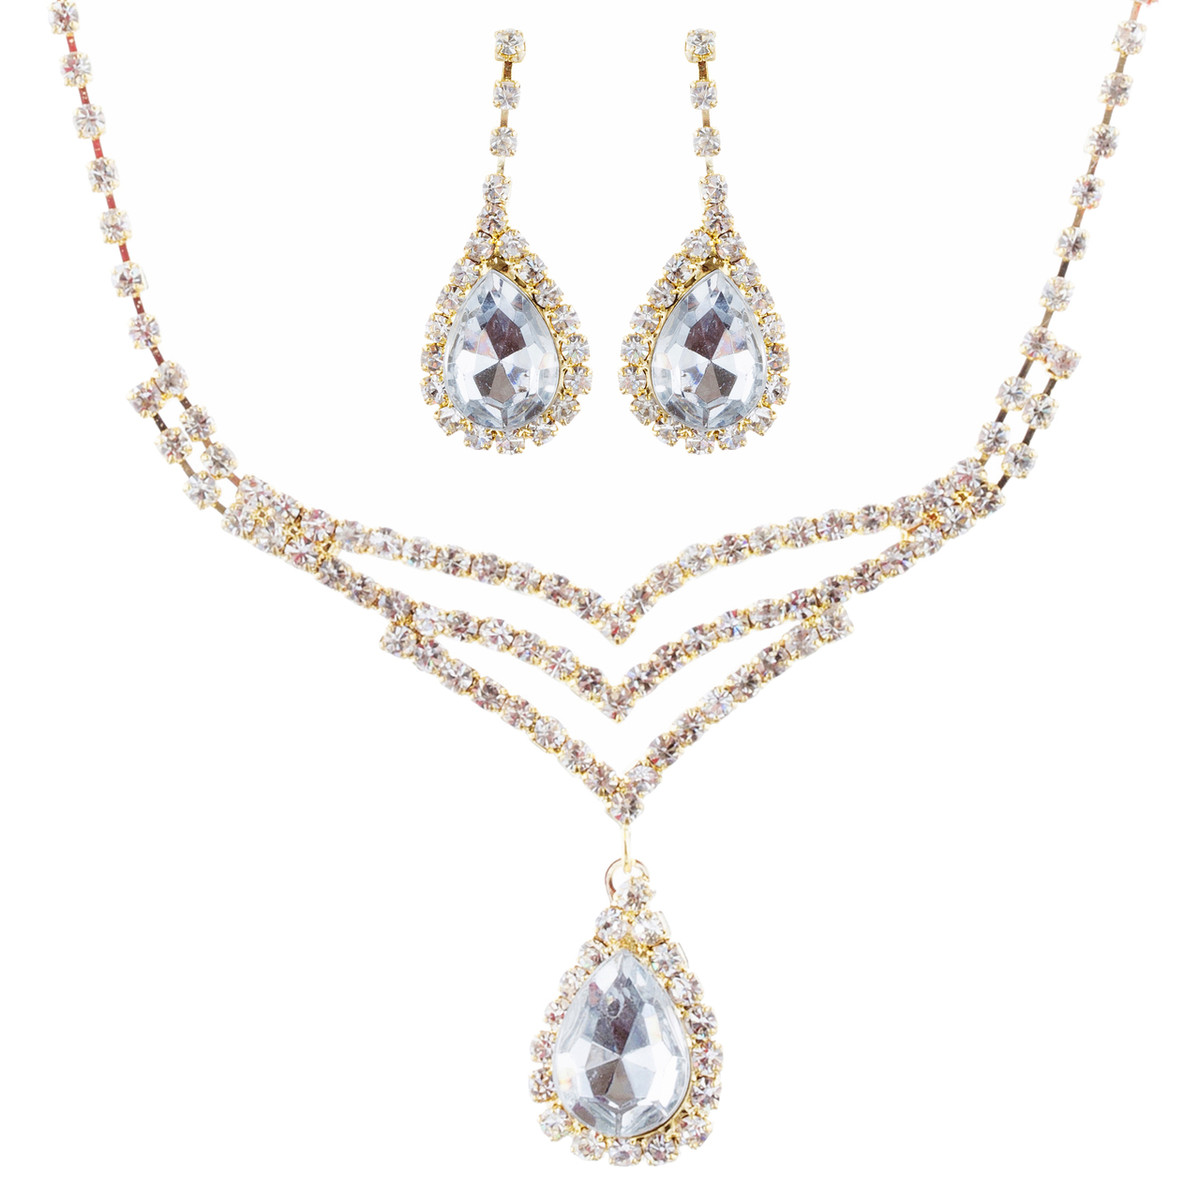 Accessoriesforever Bridal Wedding Jewelry Set Crystal Rhinestone